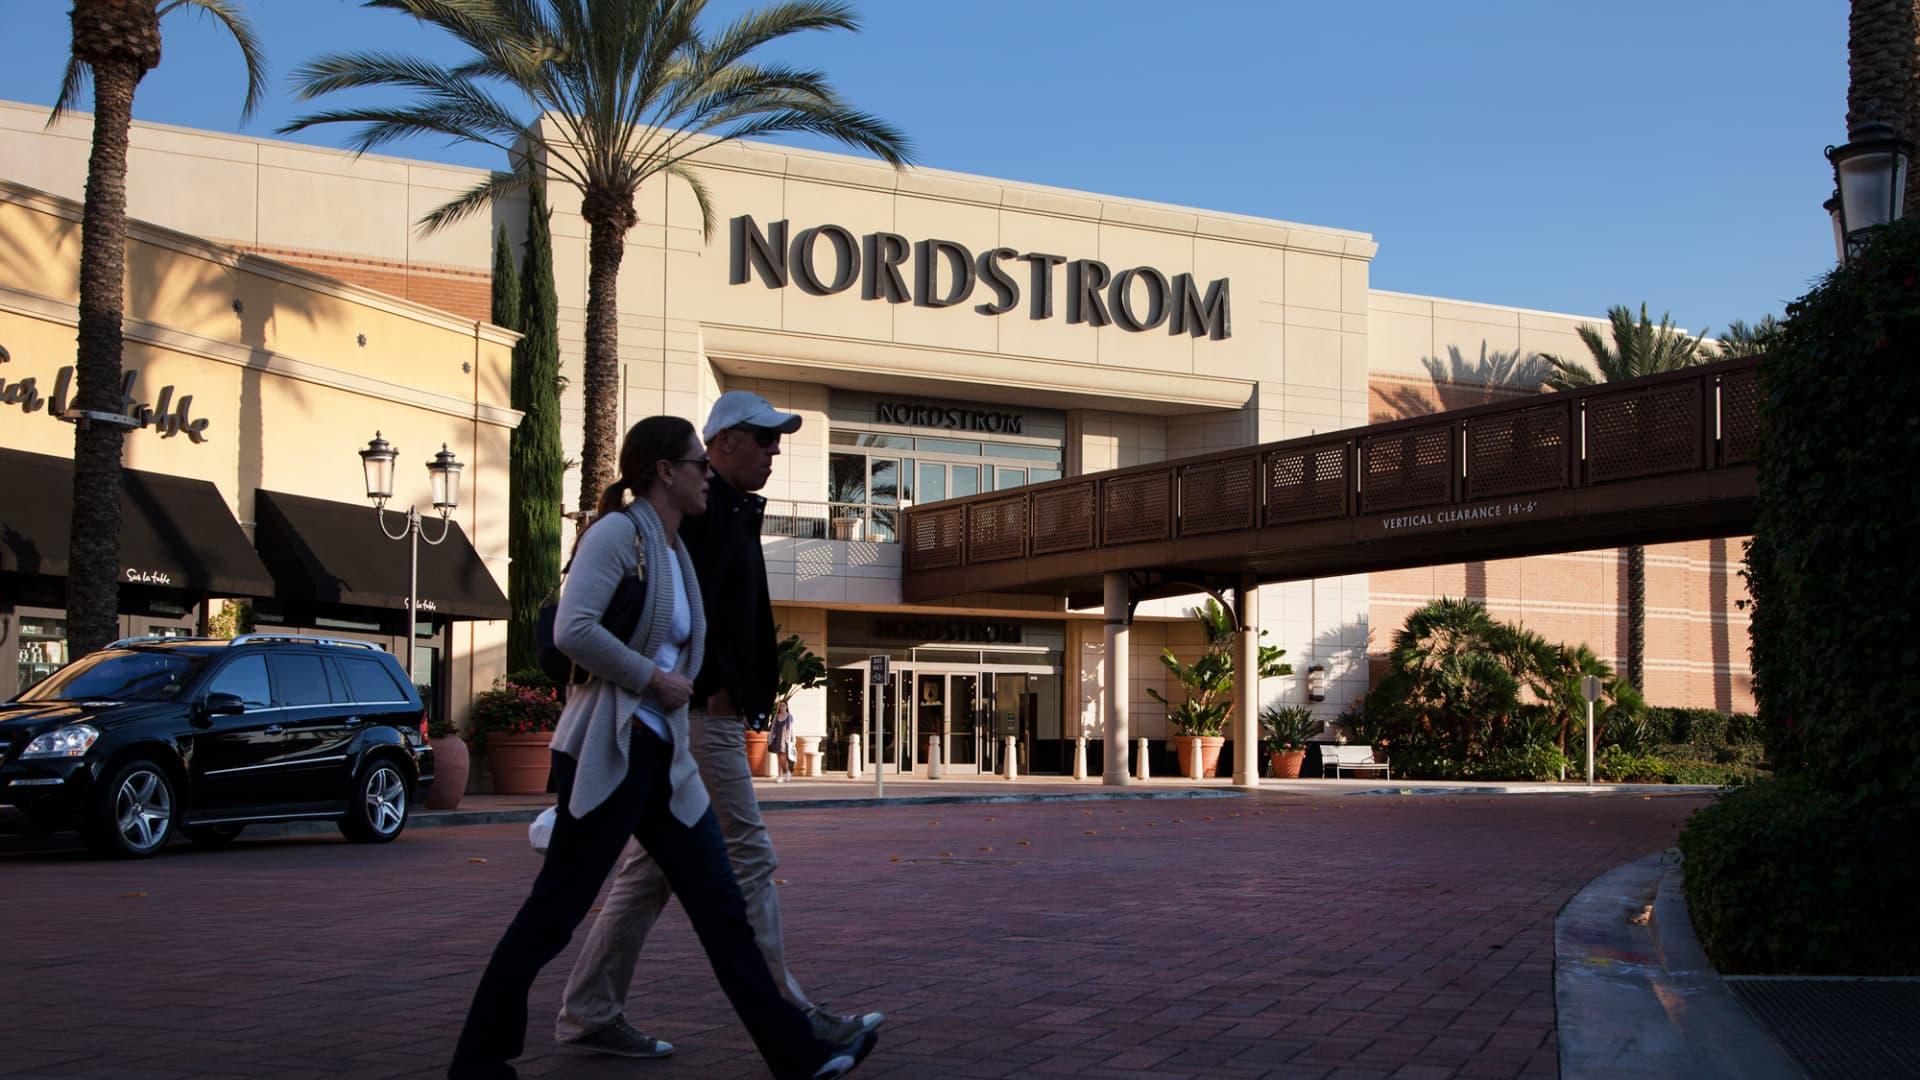 A Nordstrom store in Irvine, California.